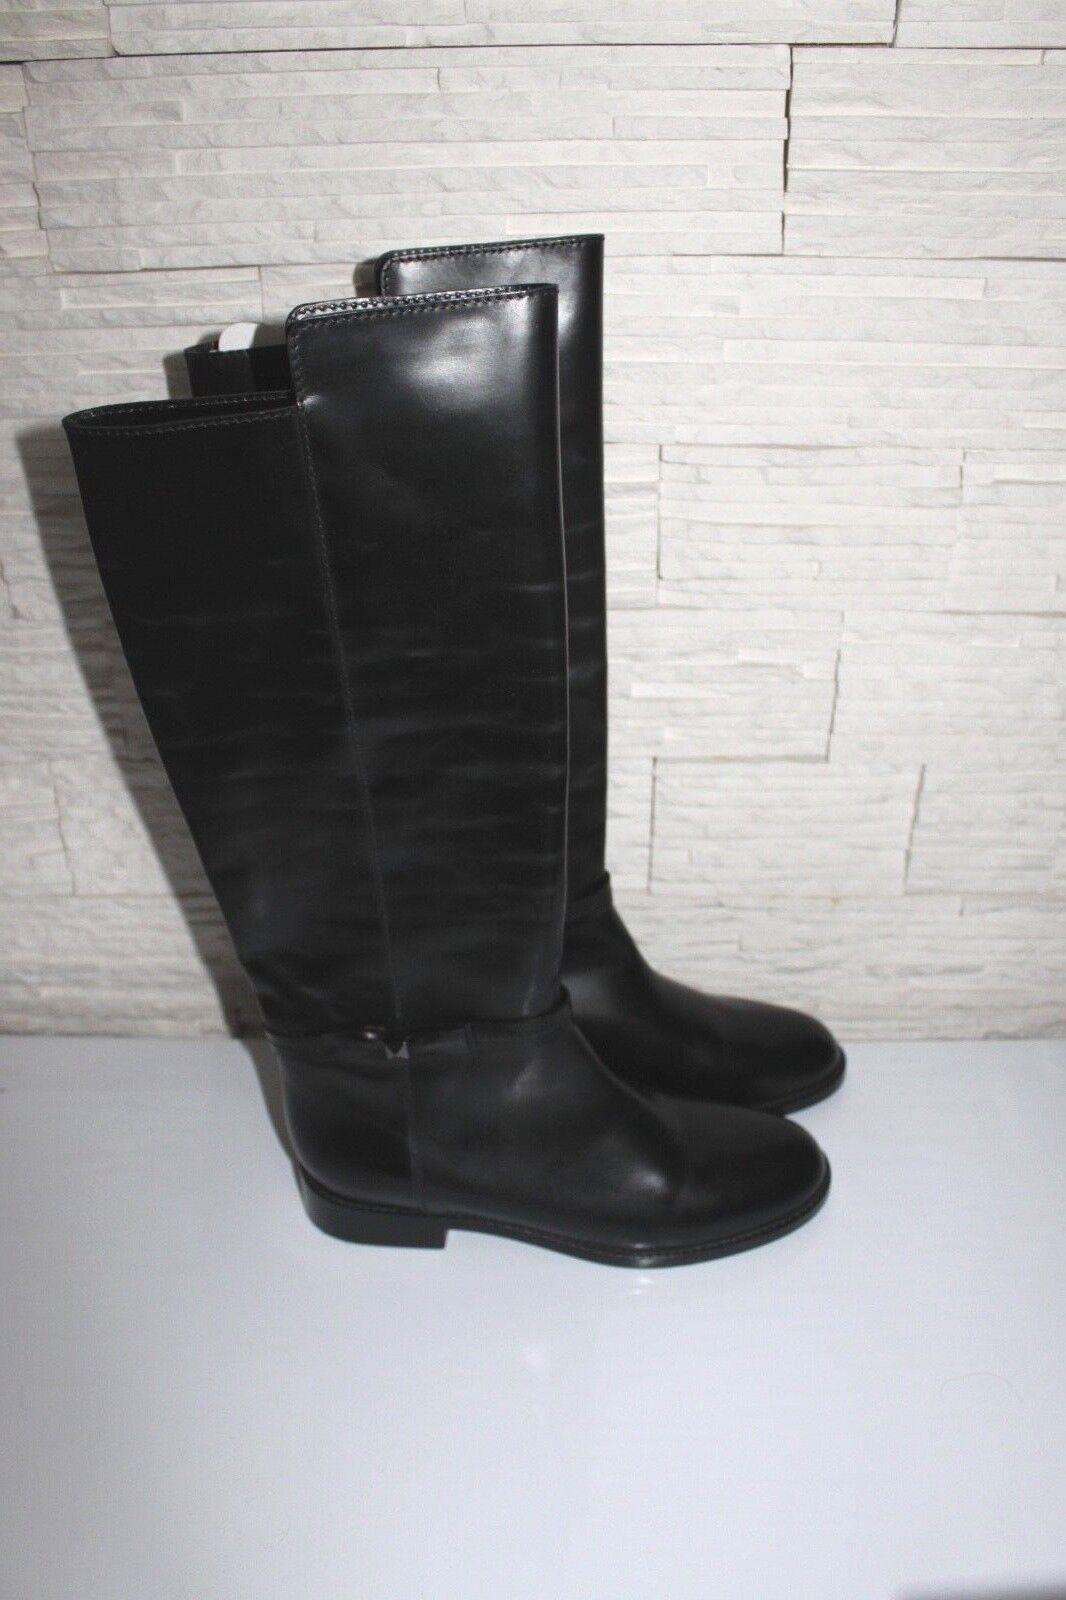 Marc Jacobs Stiefel Size 39,5